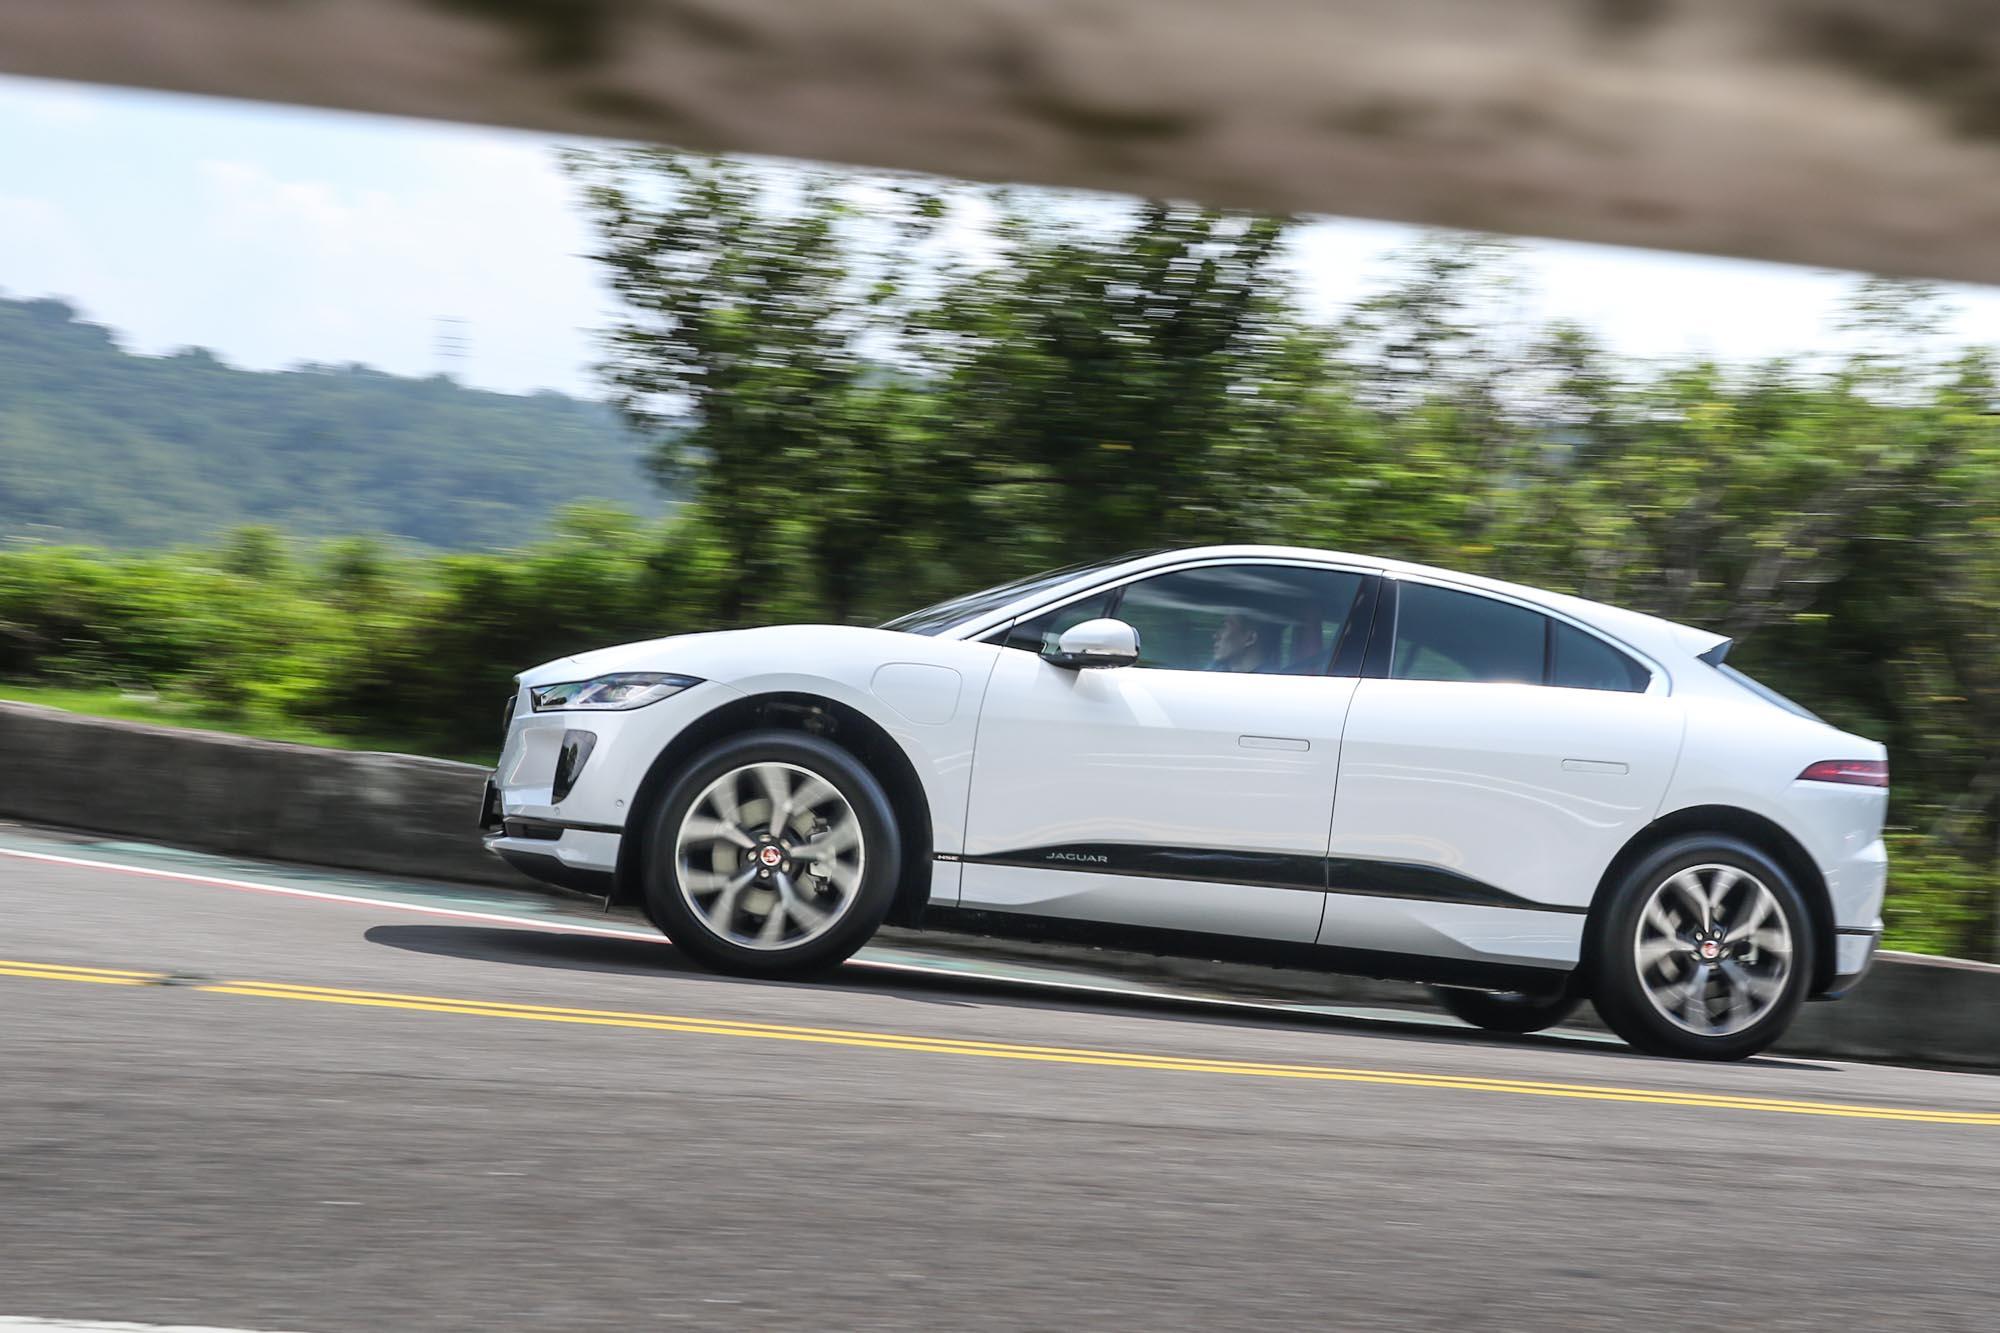 Jaguar I-PACE 售價 333 萬起,靜止加速至100km/h 僅需 4.8 秒就可完成。。